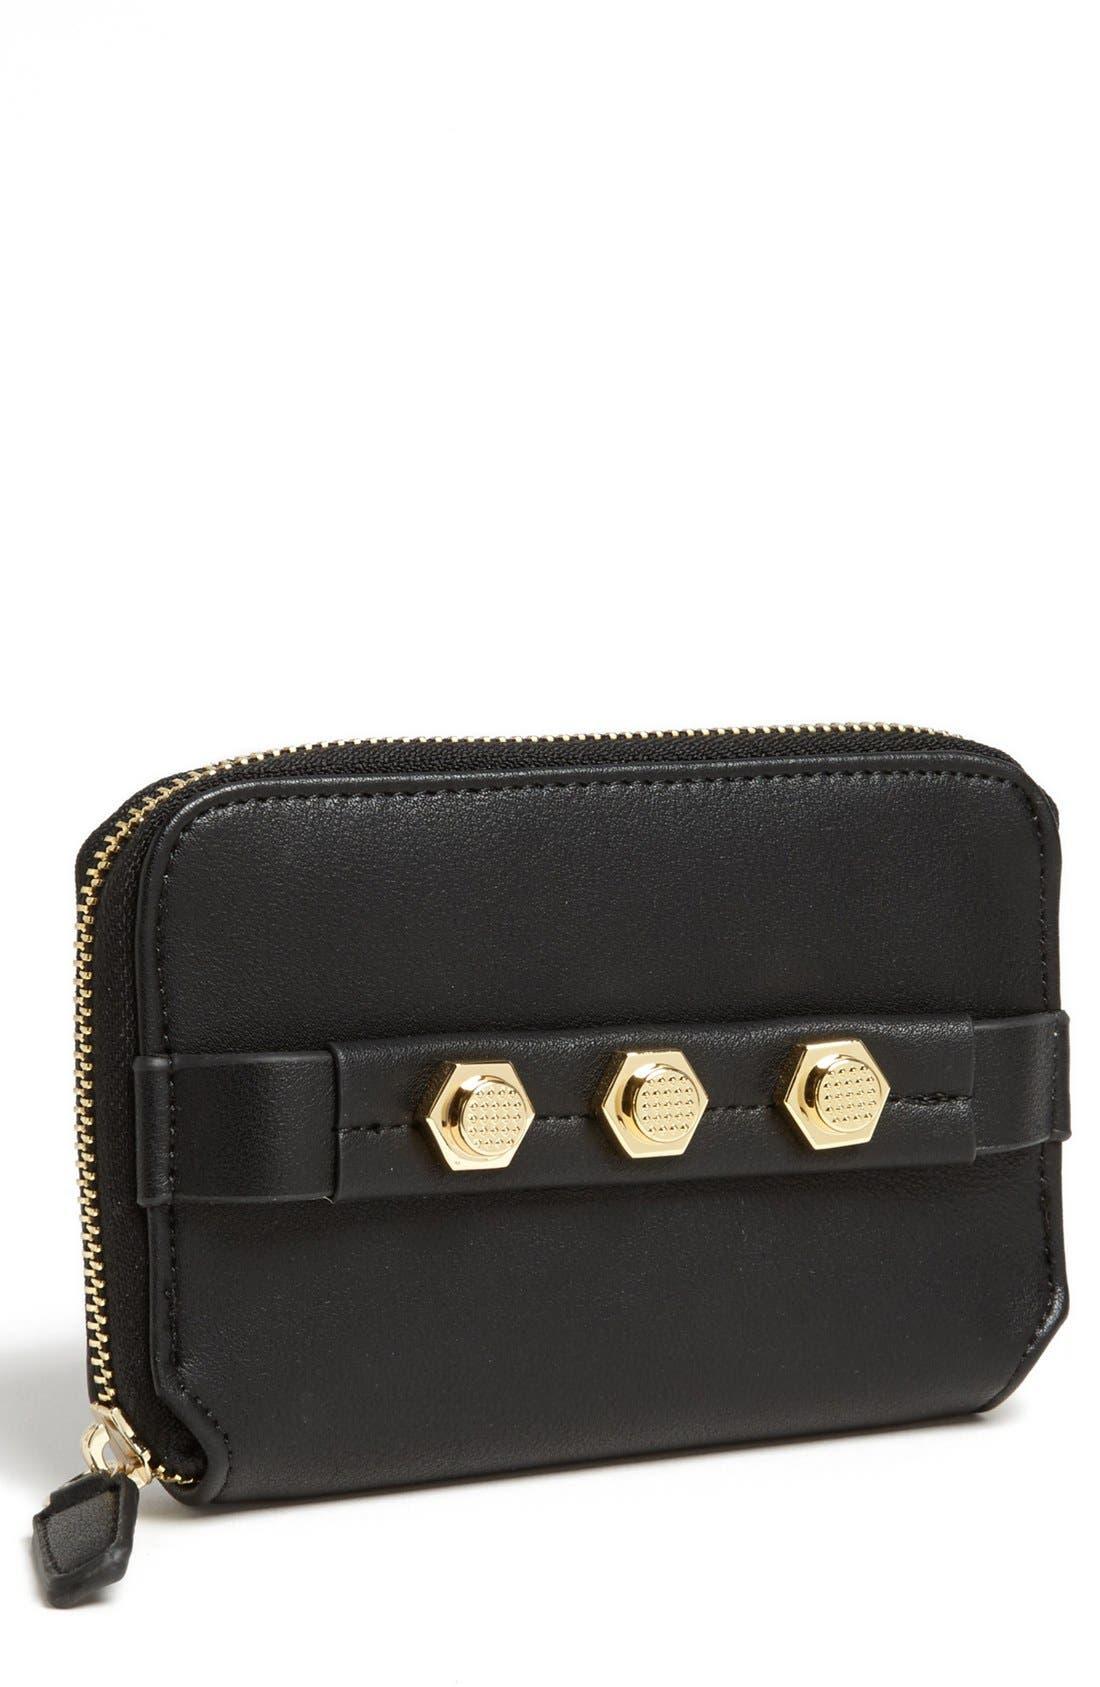 Main Image - Danielle Nicole 'Tina' Faux Leather Zip Around Wallet